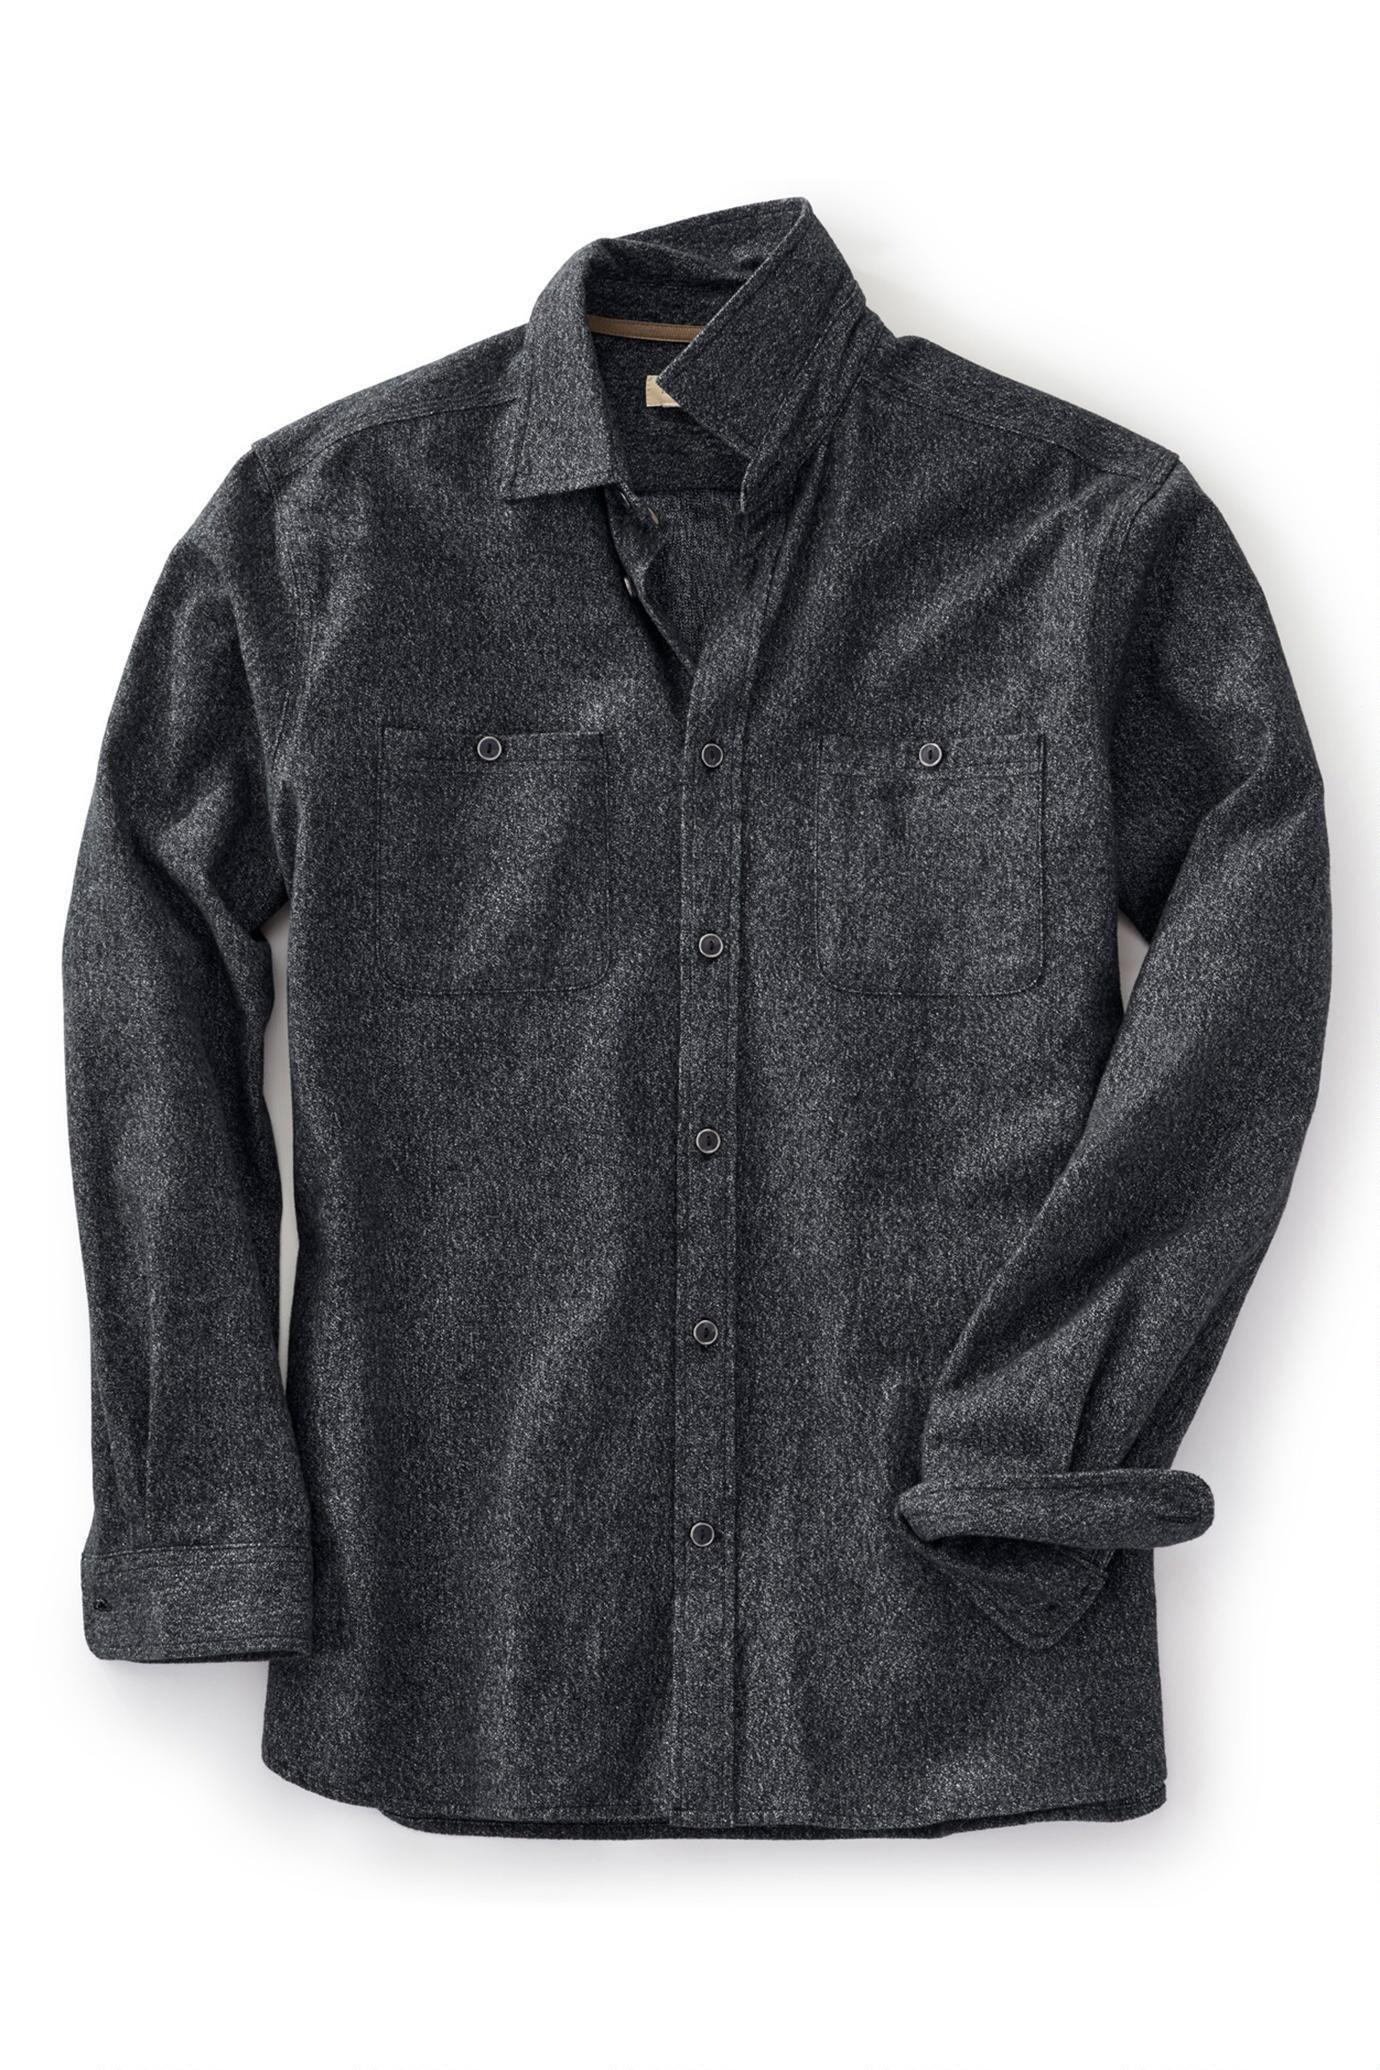 Flannel shirt black and grey  Well Seasoned Flannel Shirt  New Look  Pinterest  Flannel shirt